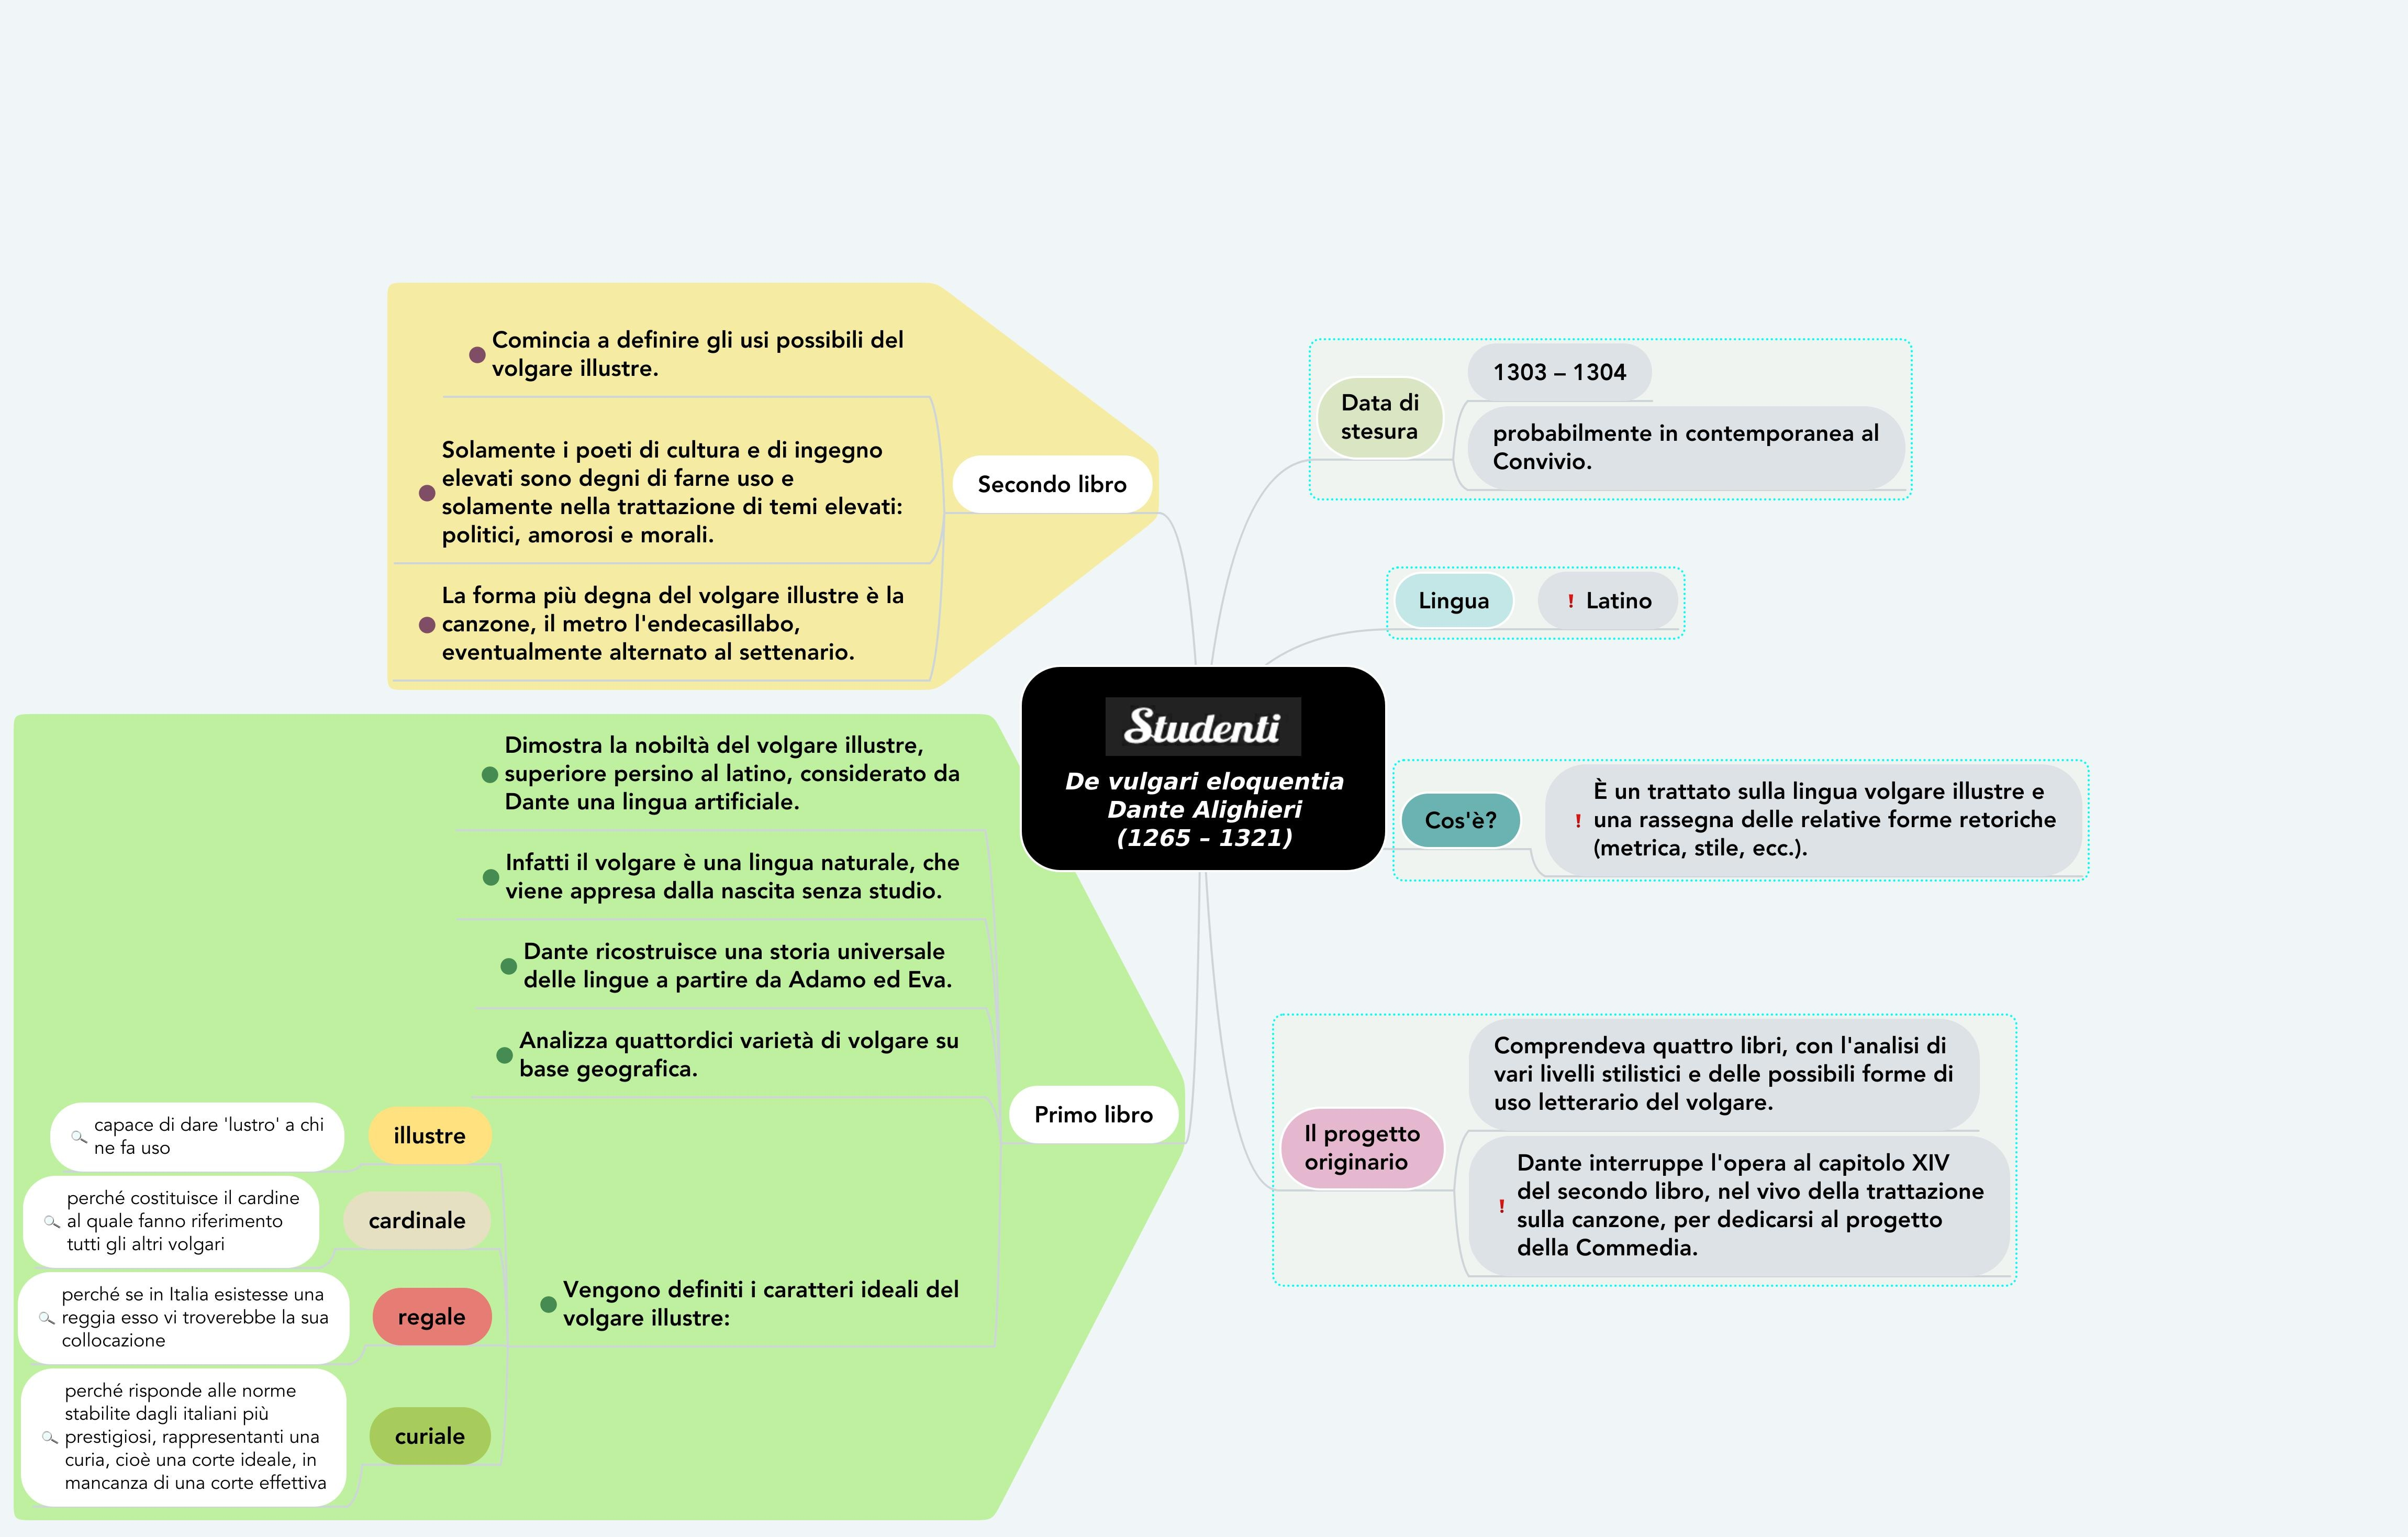 Commentary diagram on the de Vulcare discourse by Dante Aligeri